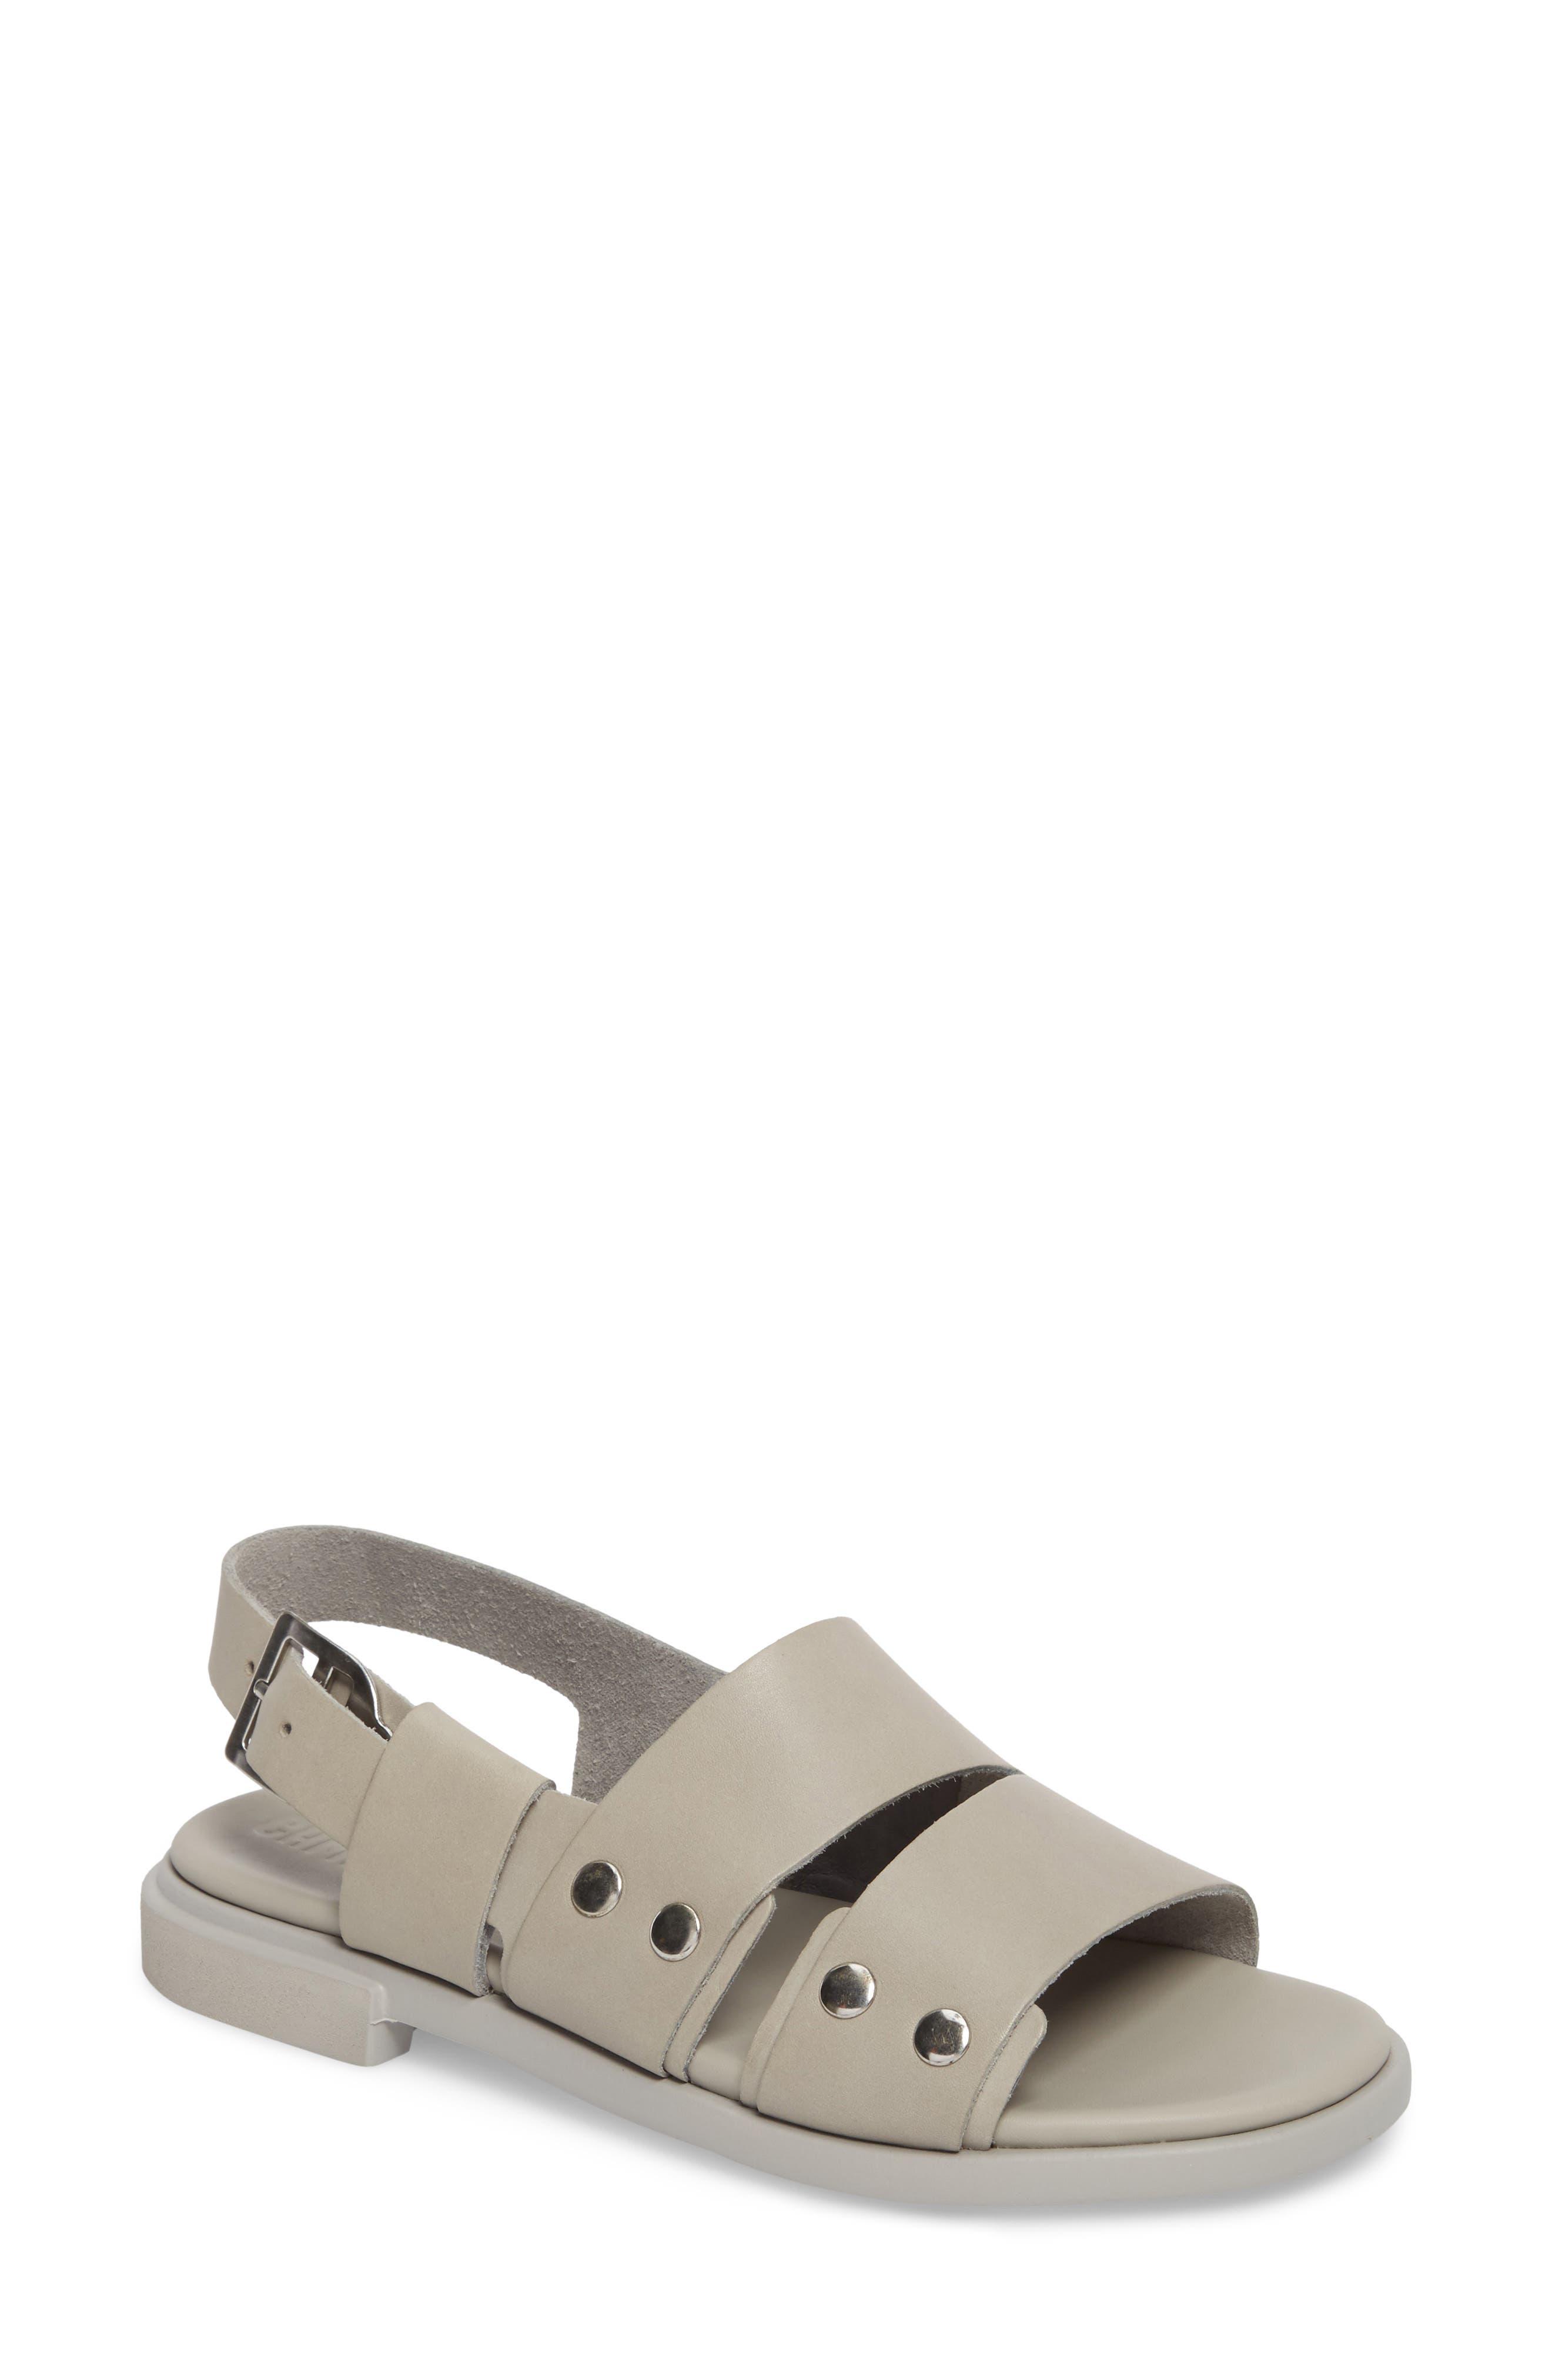 Edy Slingback Sandal,                         Main,                         color, 050